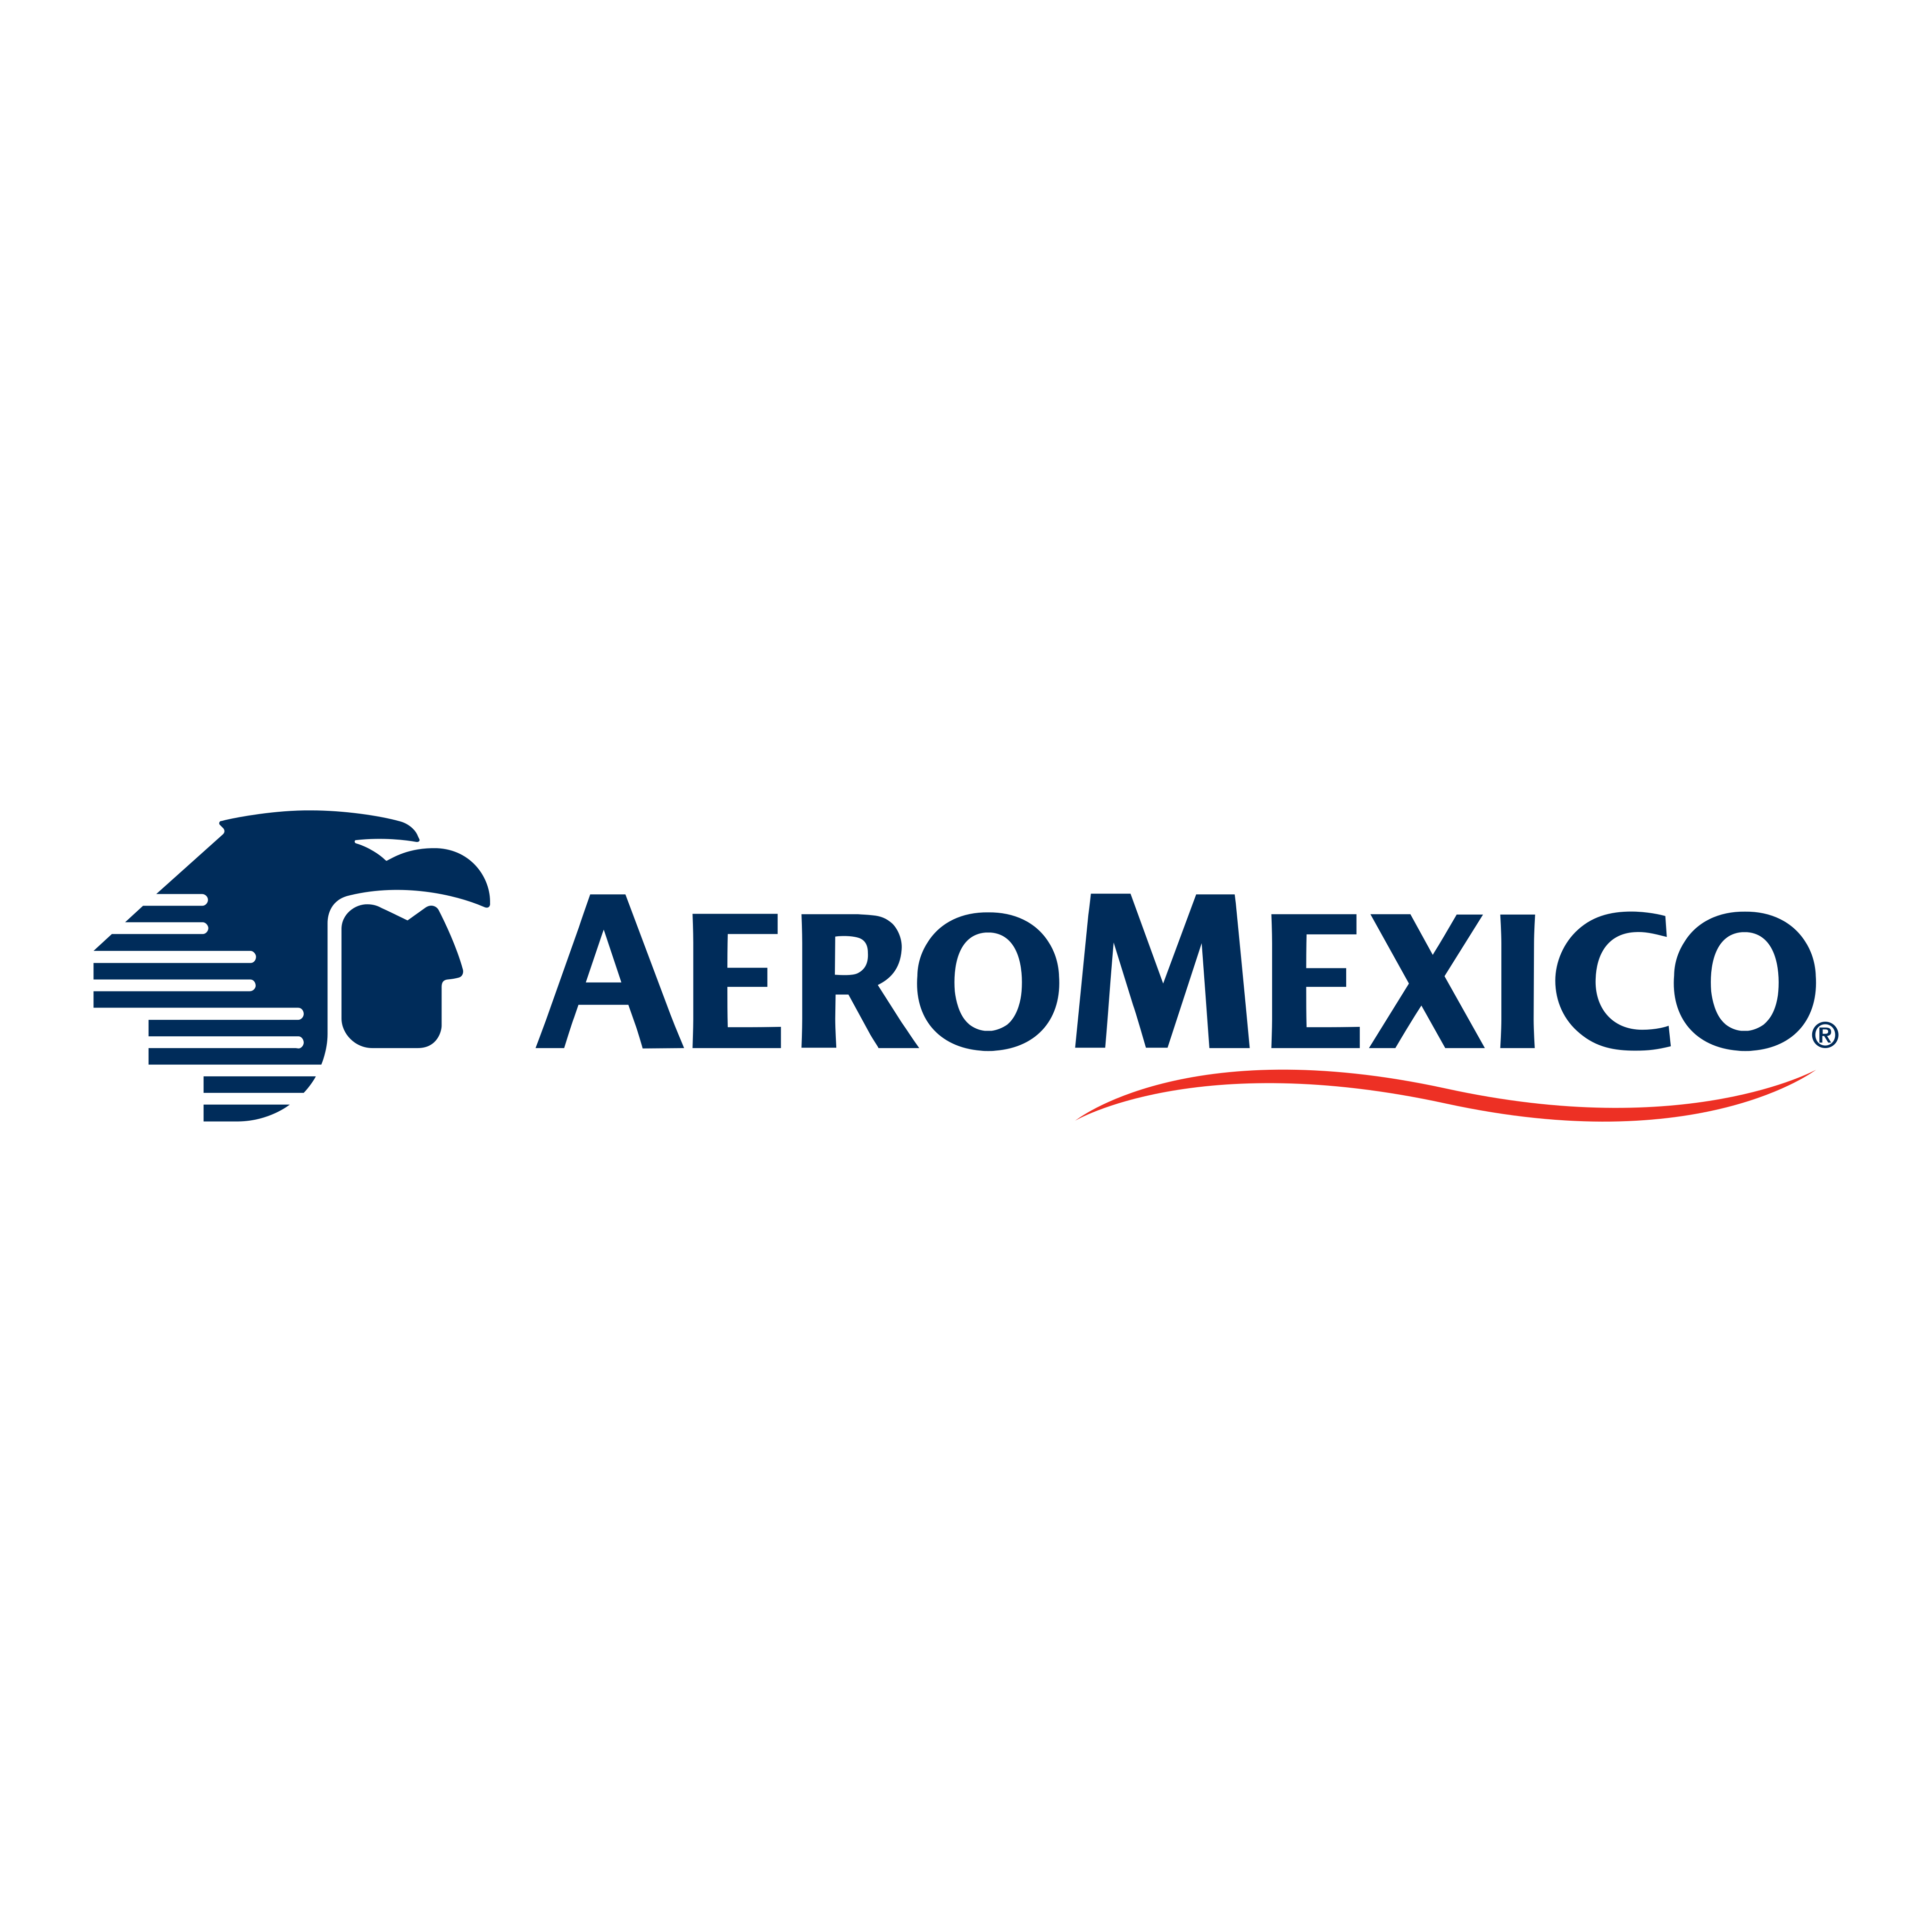 aeromexico logo 0 - Aeromexico Logo